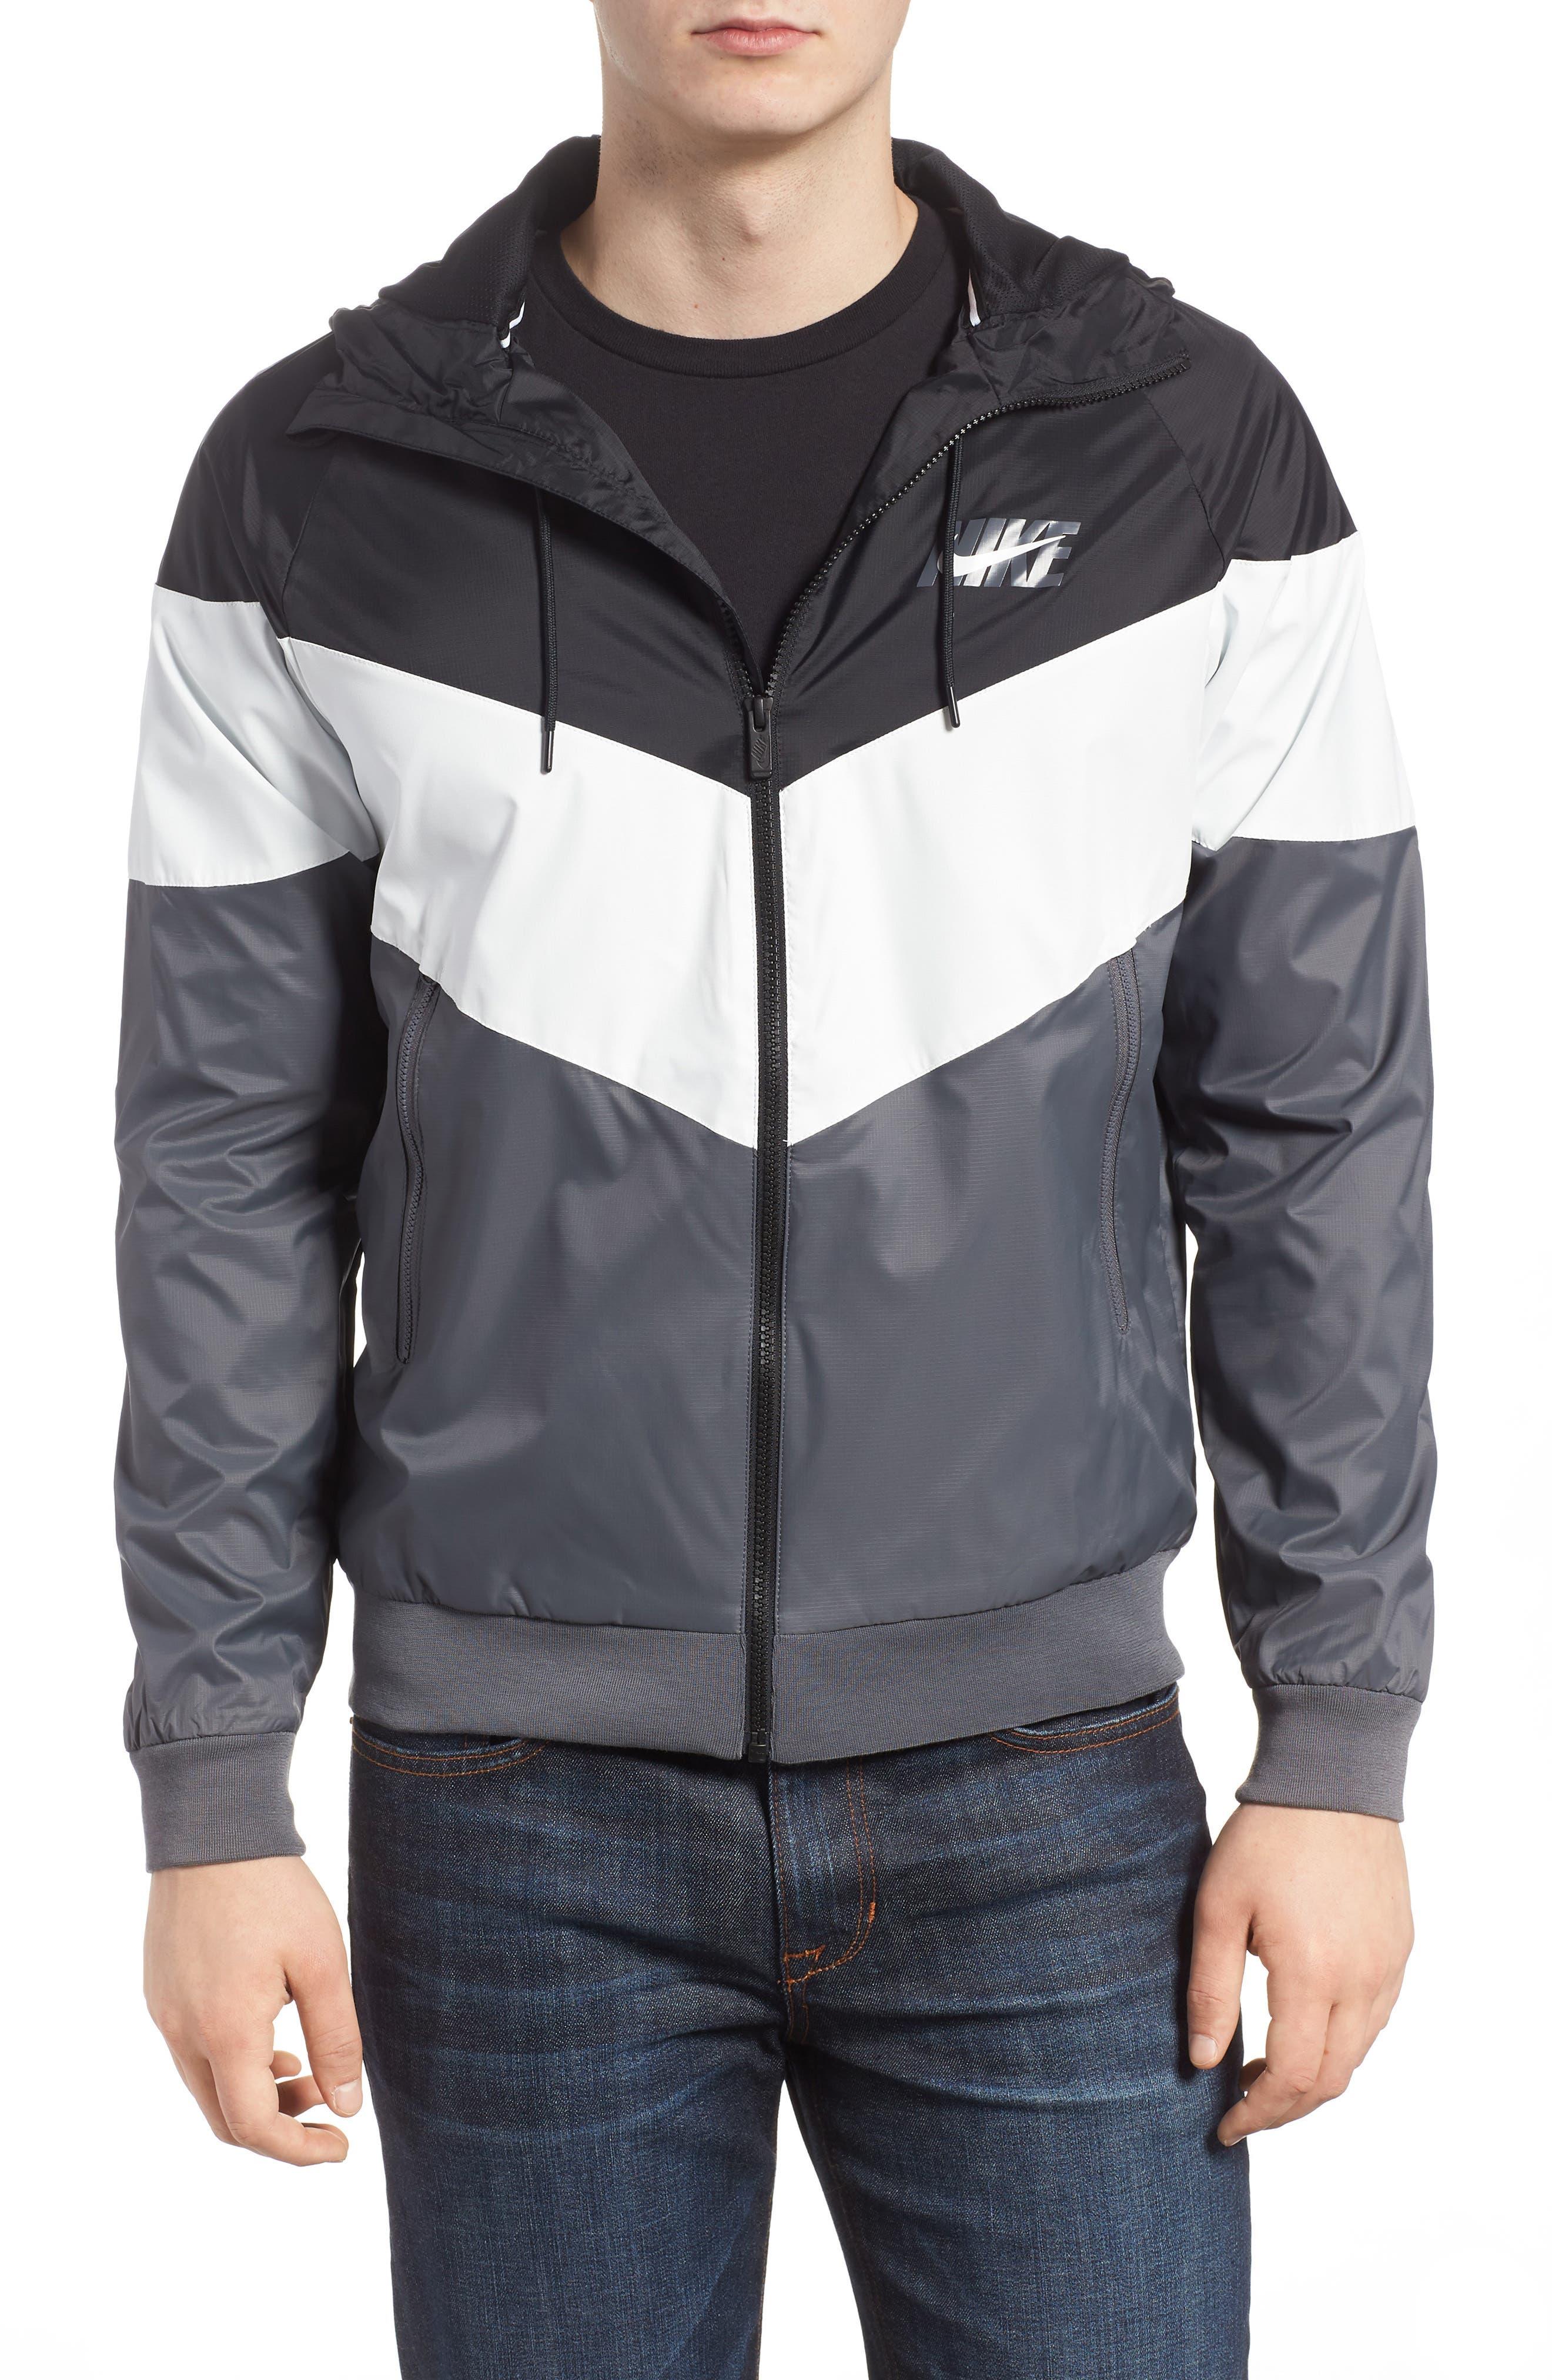 Windrunner Wind & Water Repellent Hooded Jacket,                             Main thumbnail 1, color,                             Black/ Summit White/ Dark Grey